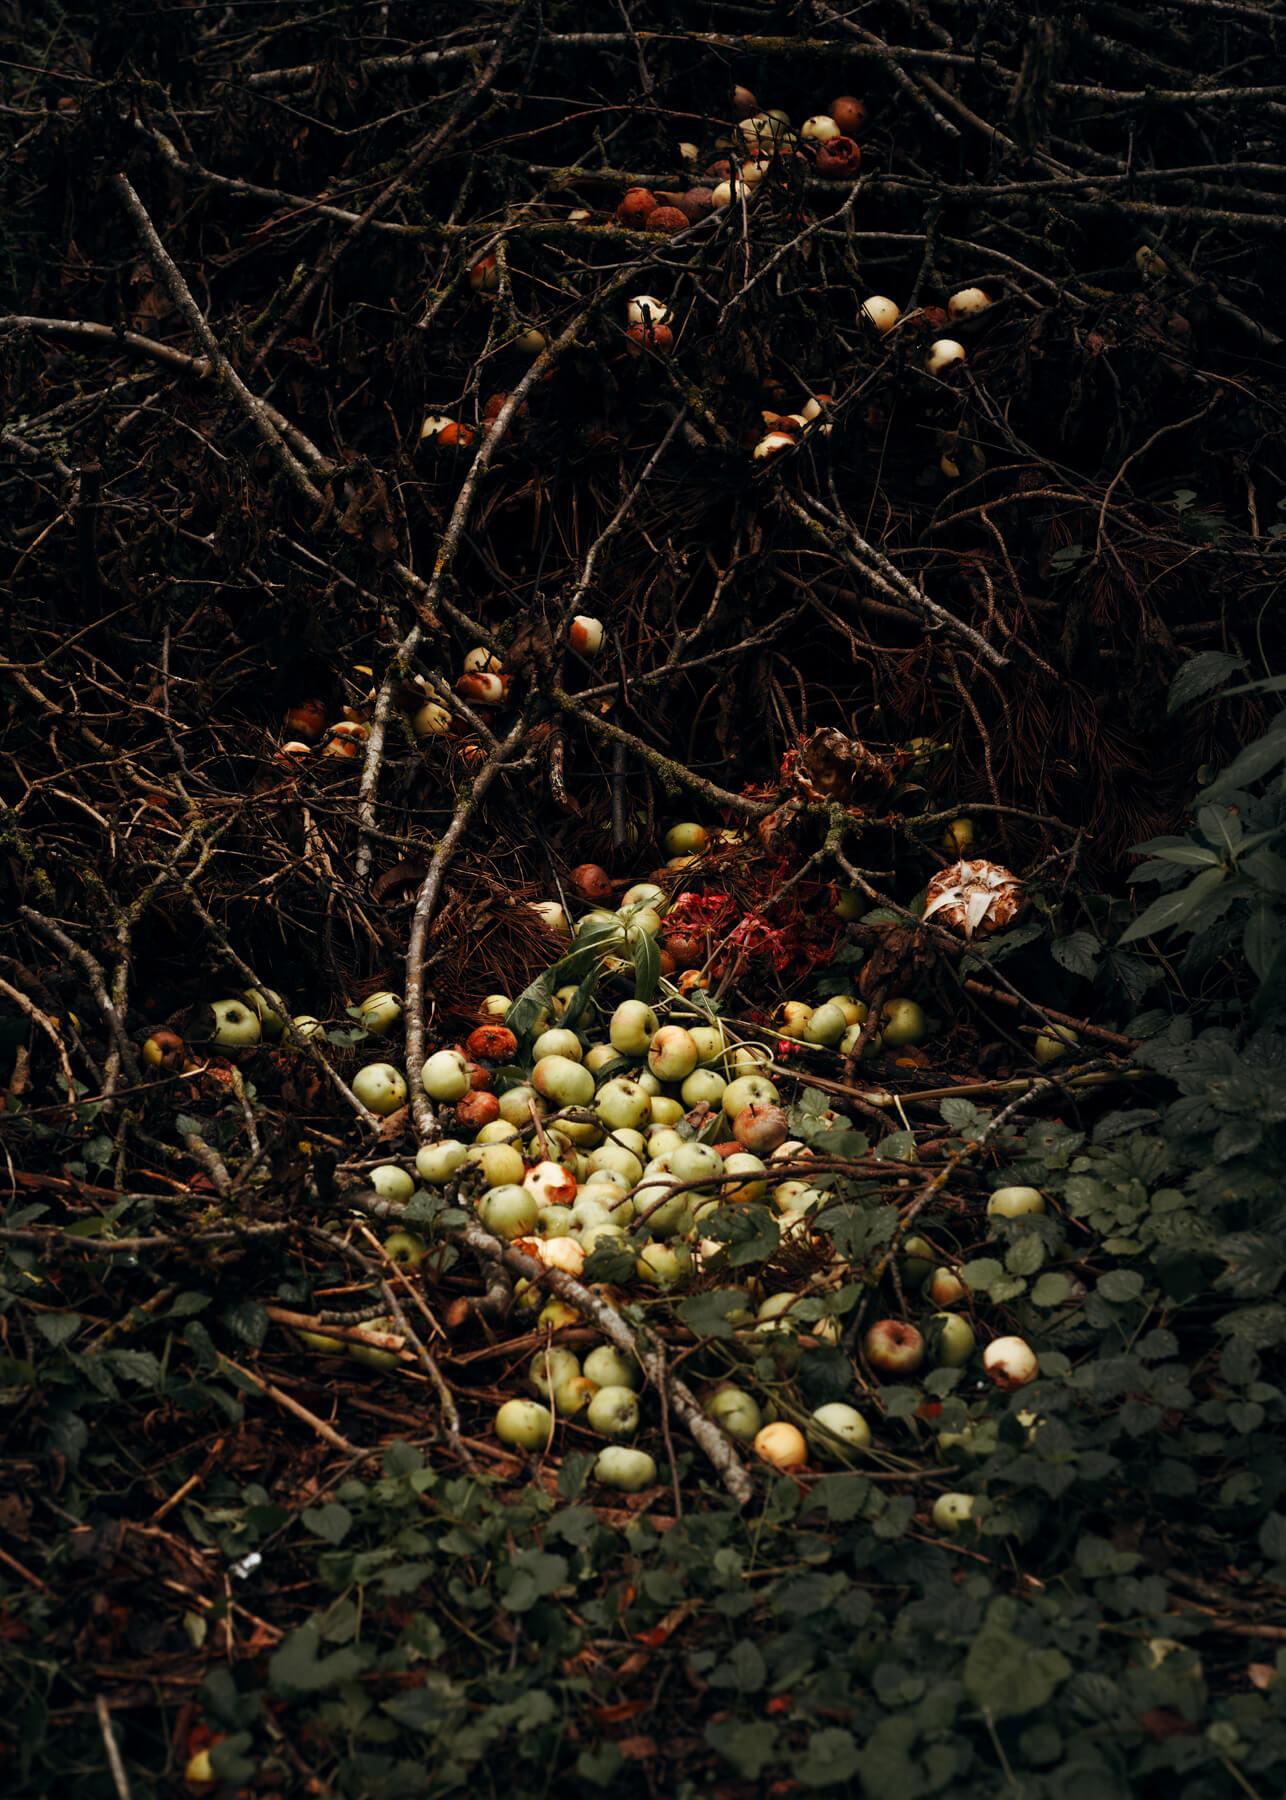 Nadja Ellinger - Path of Pins apples at base of tree